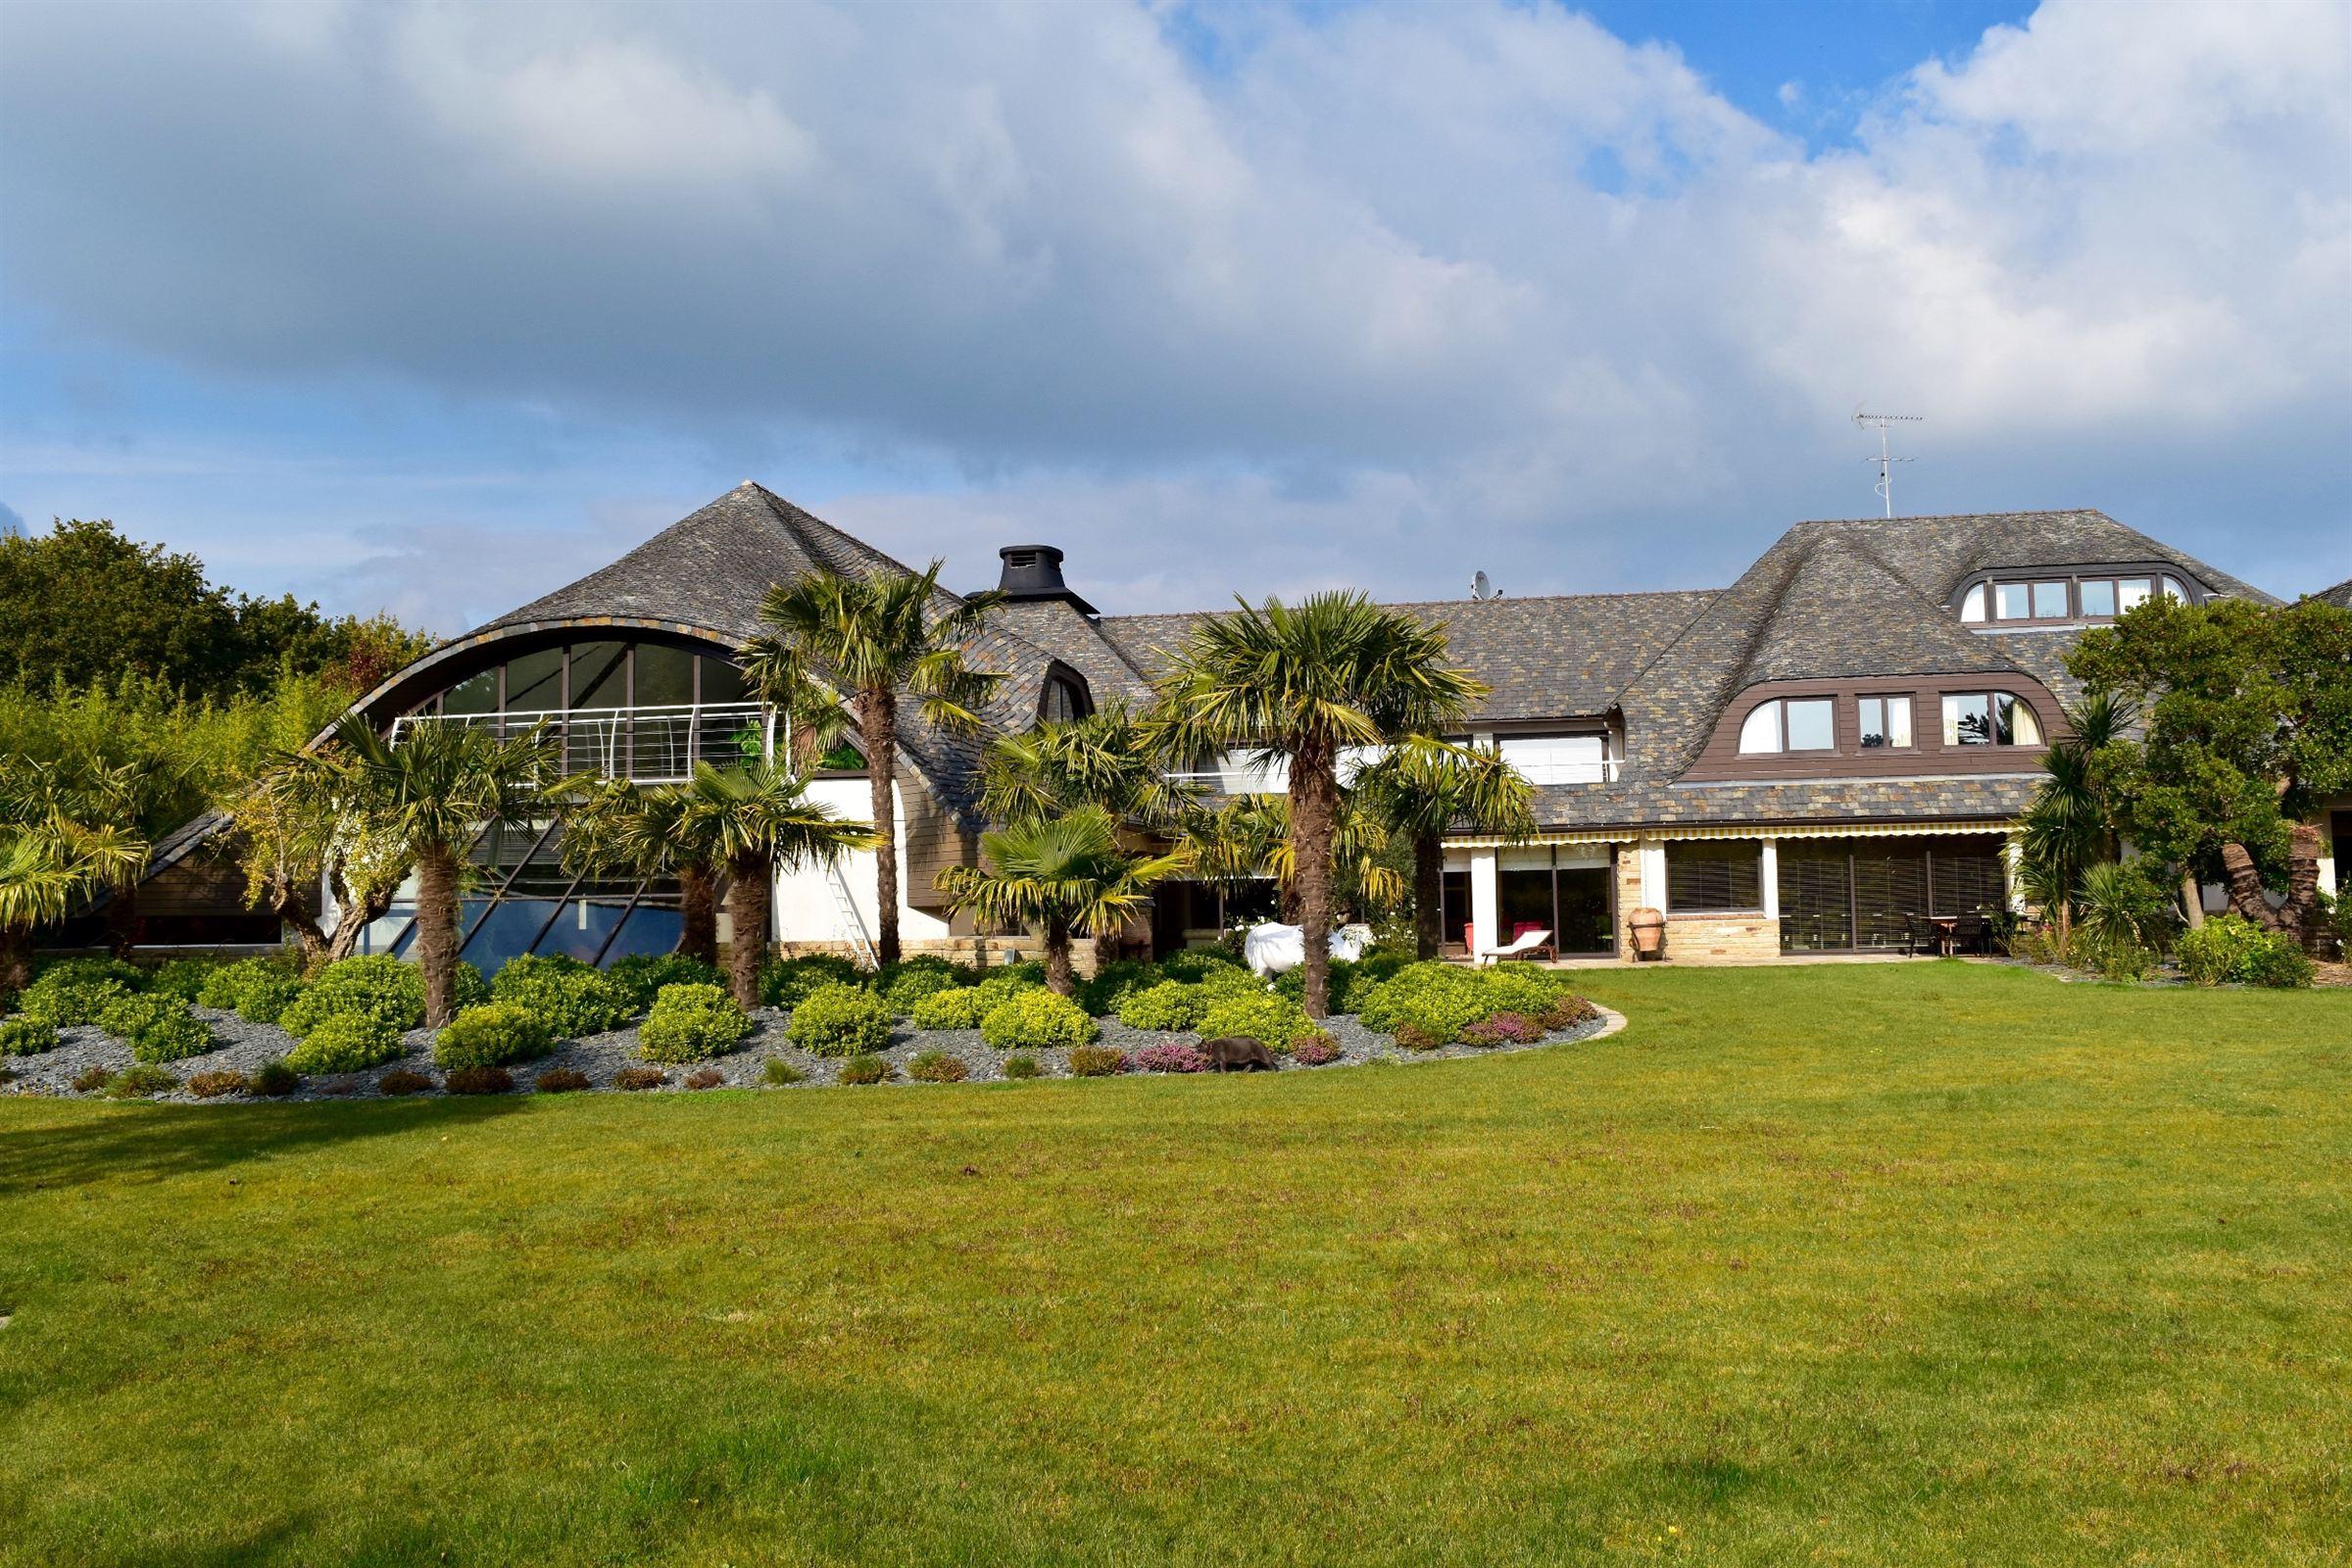 Single Family Home for Sale at Property about 1300m2 in a secure domain Guerande, Pays De La Loire, 44350 France